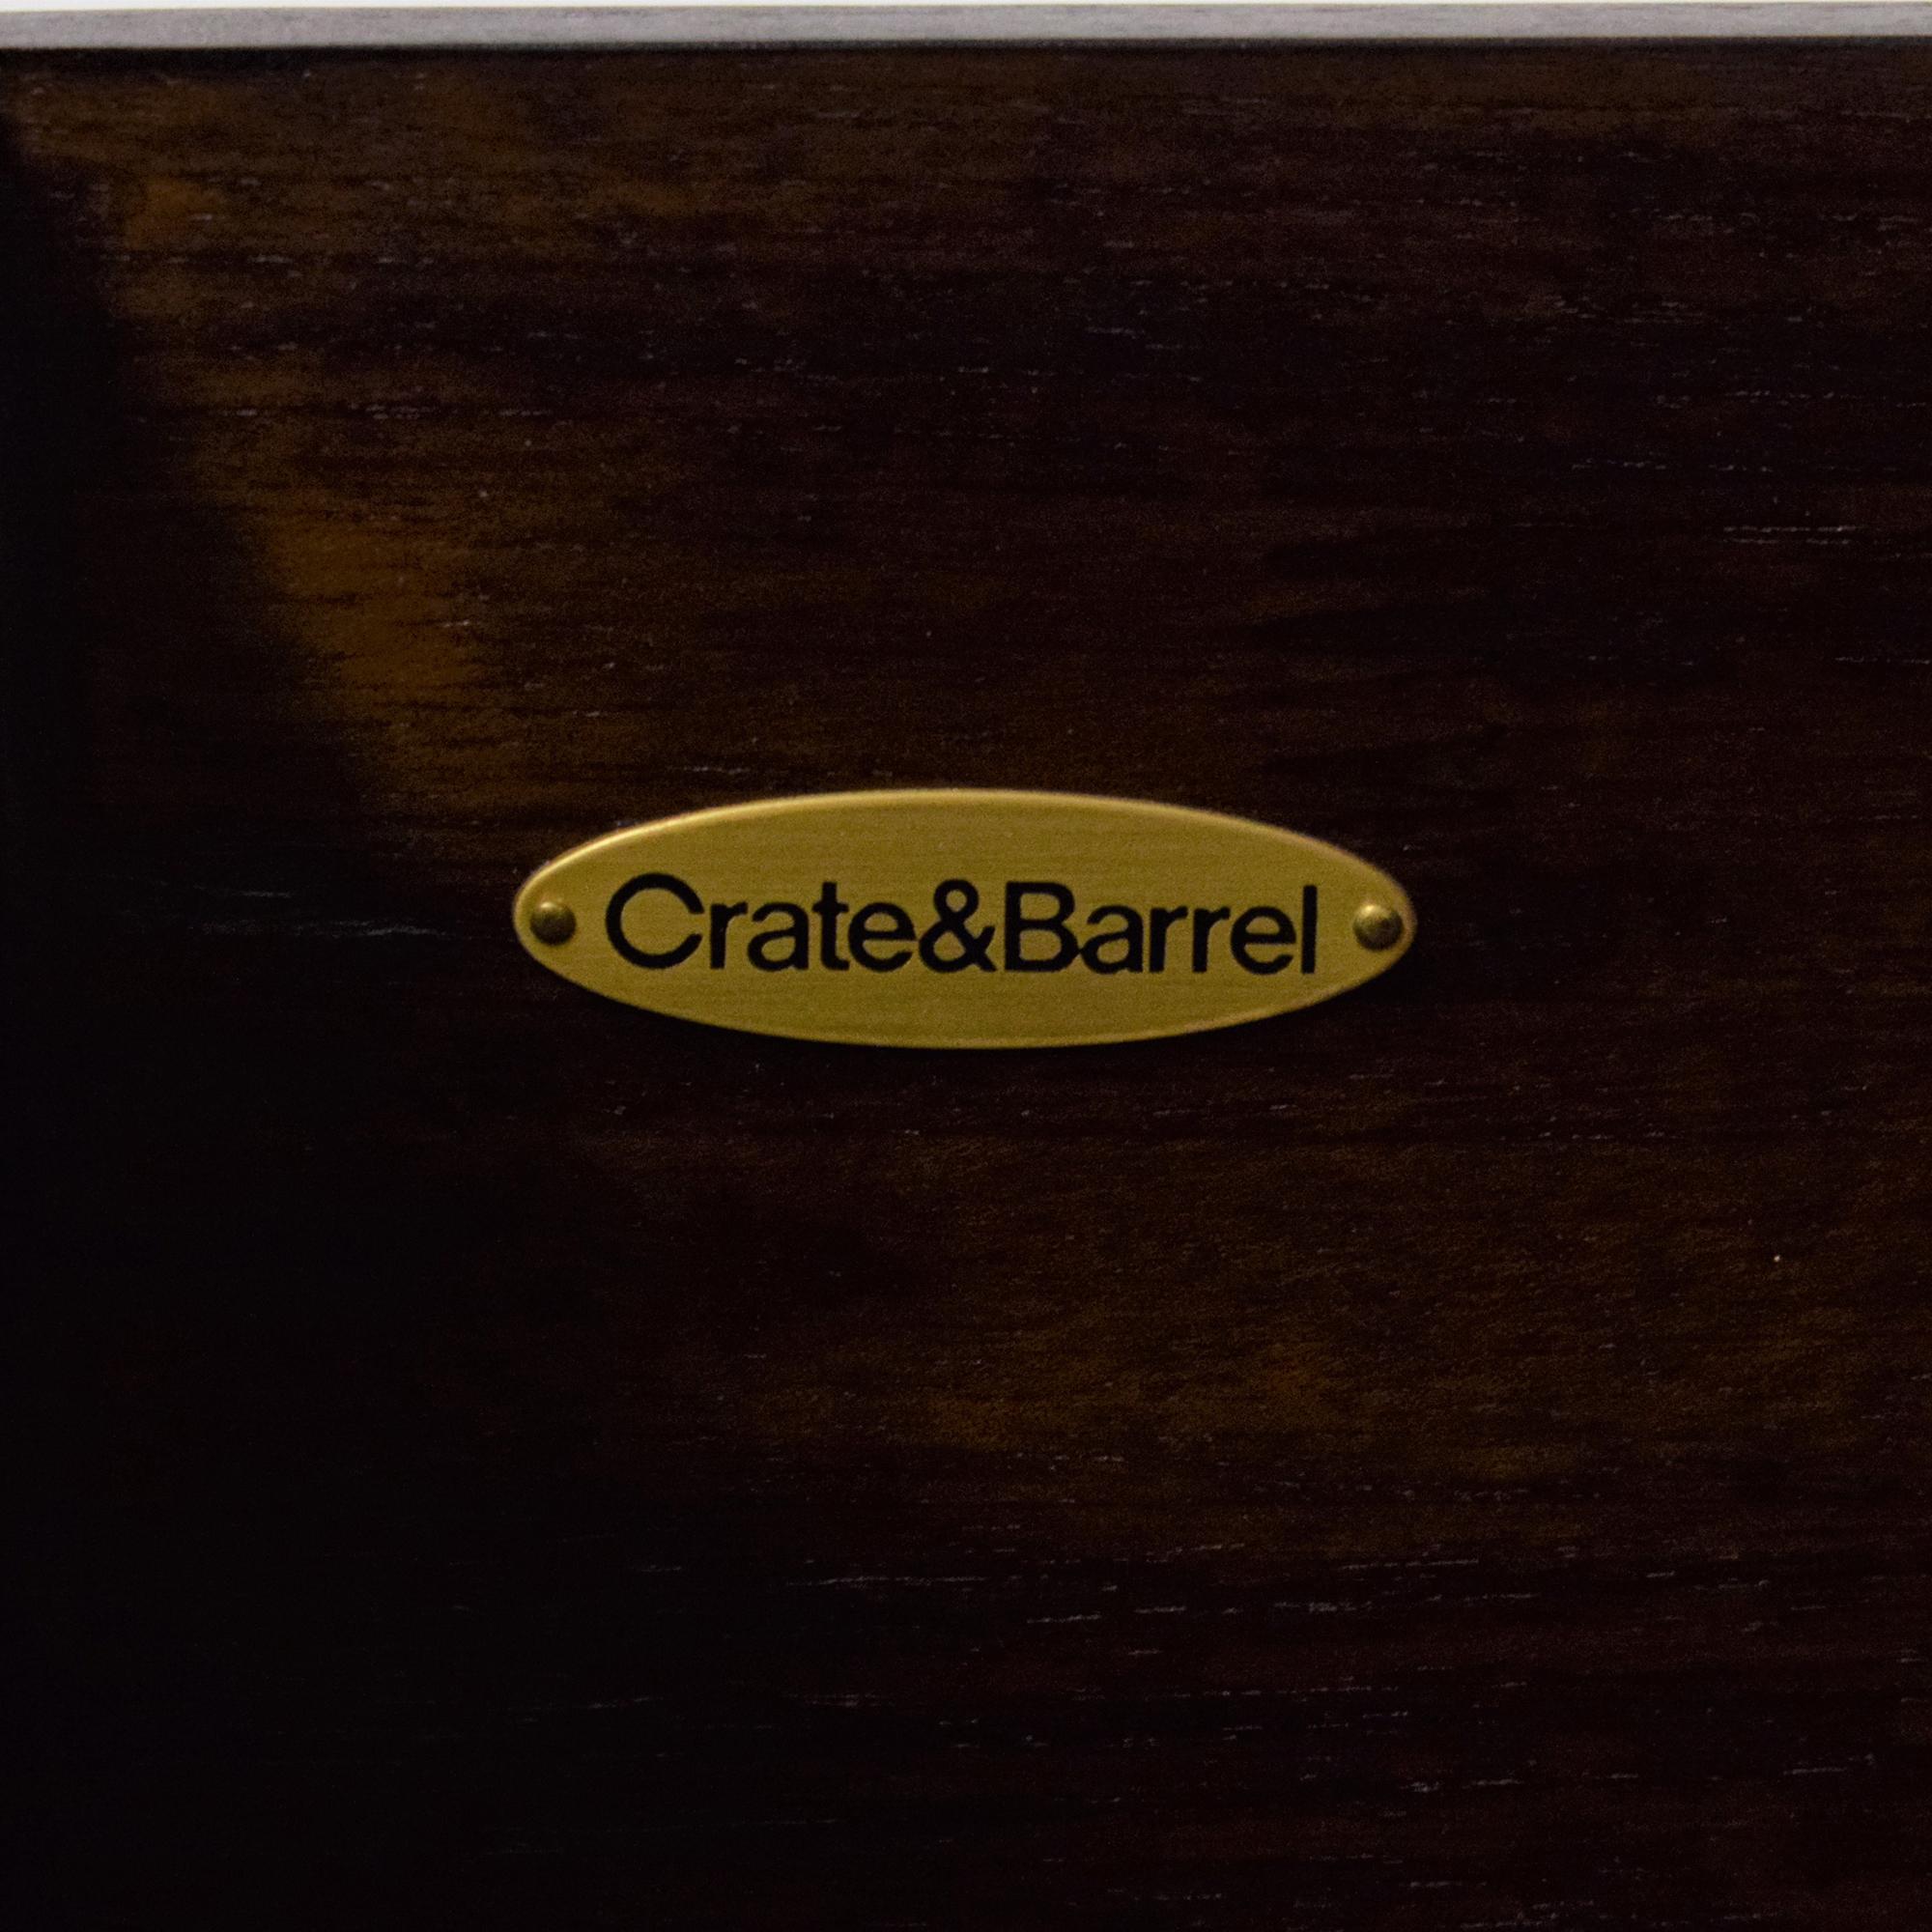 Crate & Barrel Crate & Barrel Entertainment Center brown